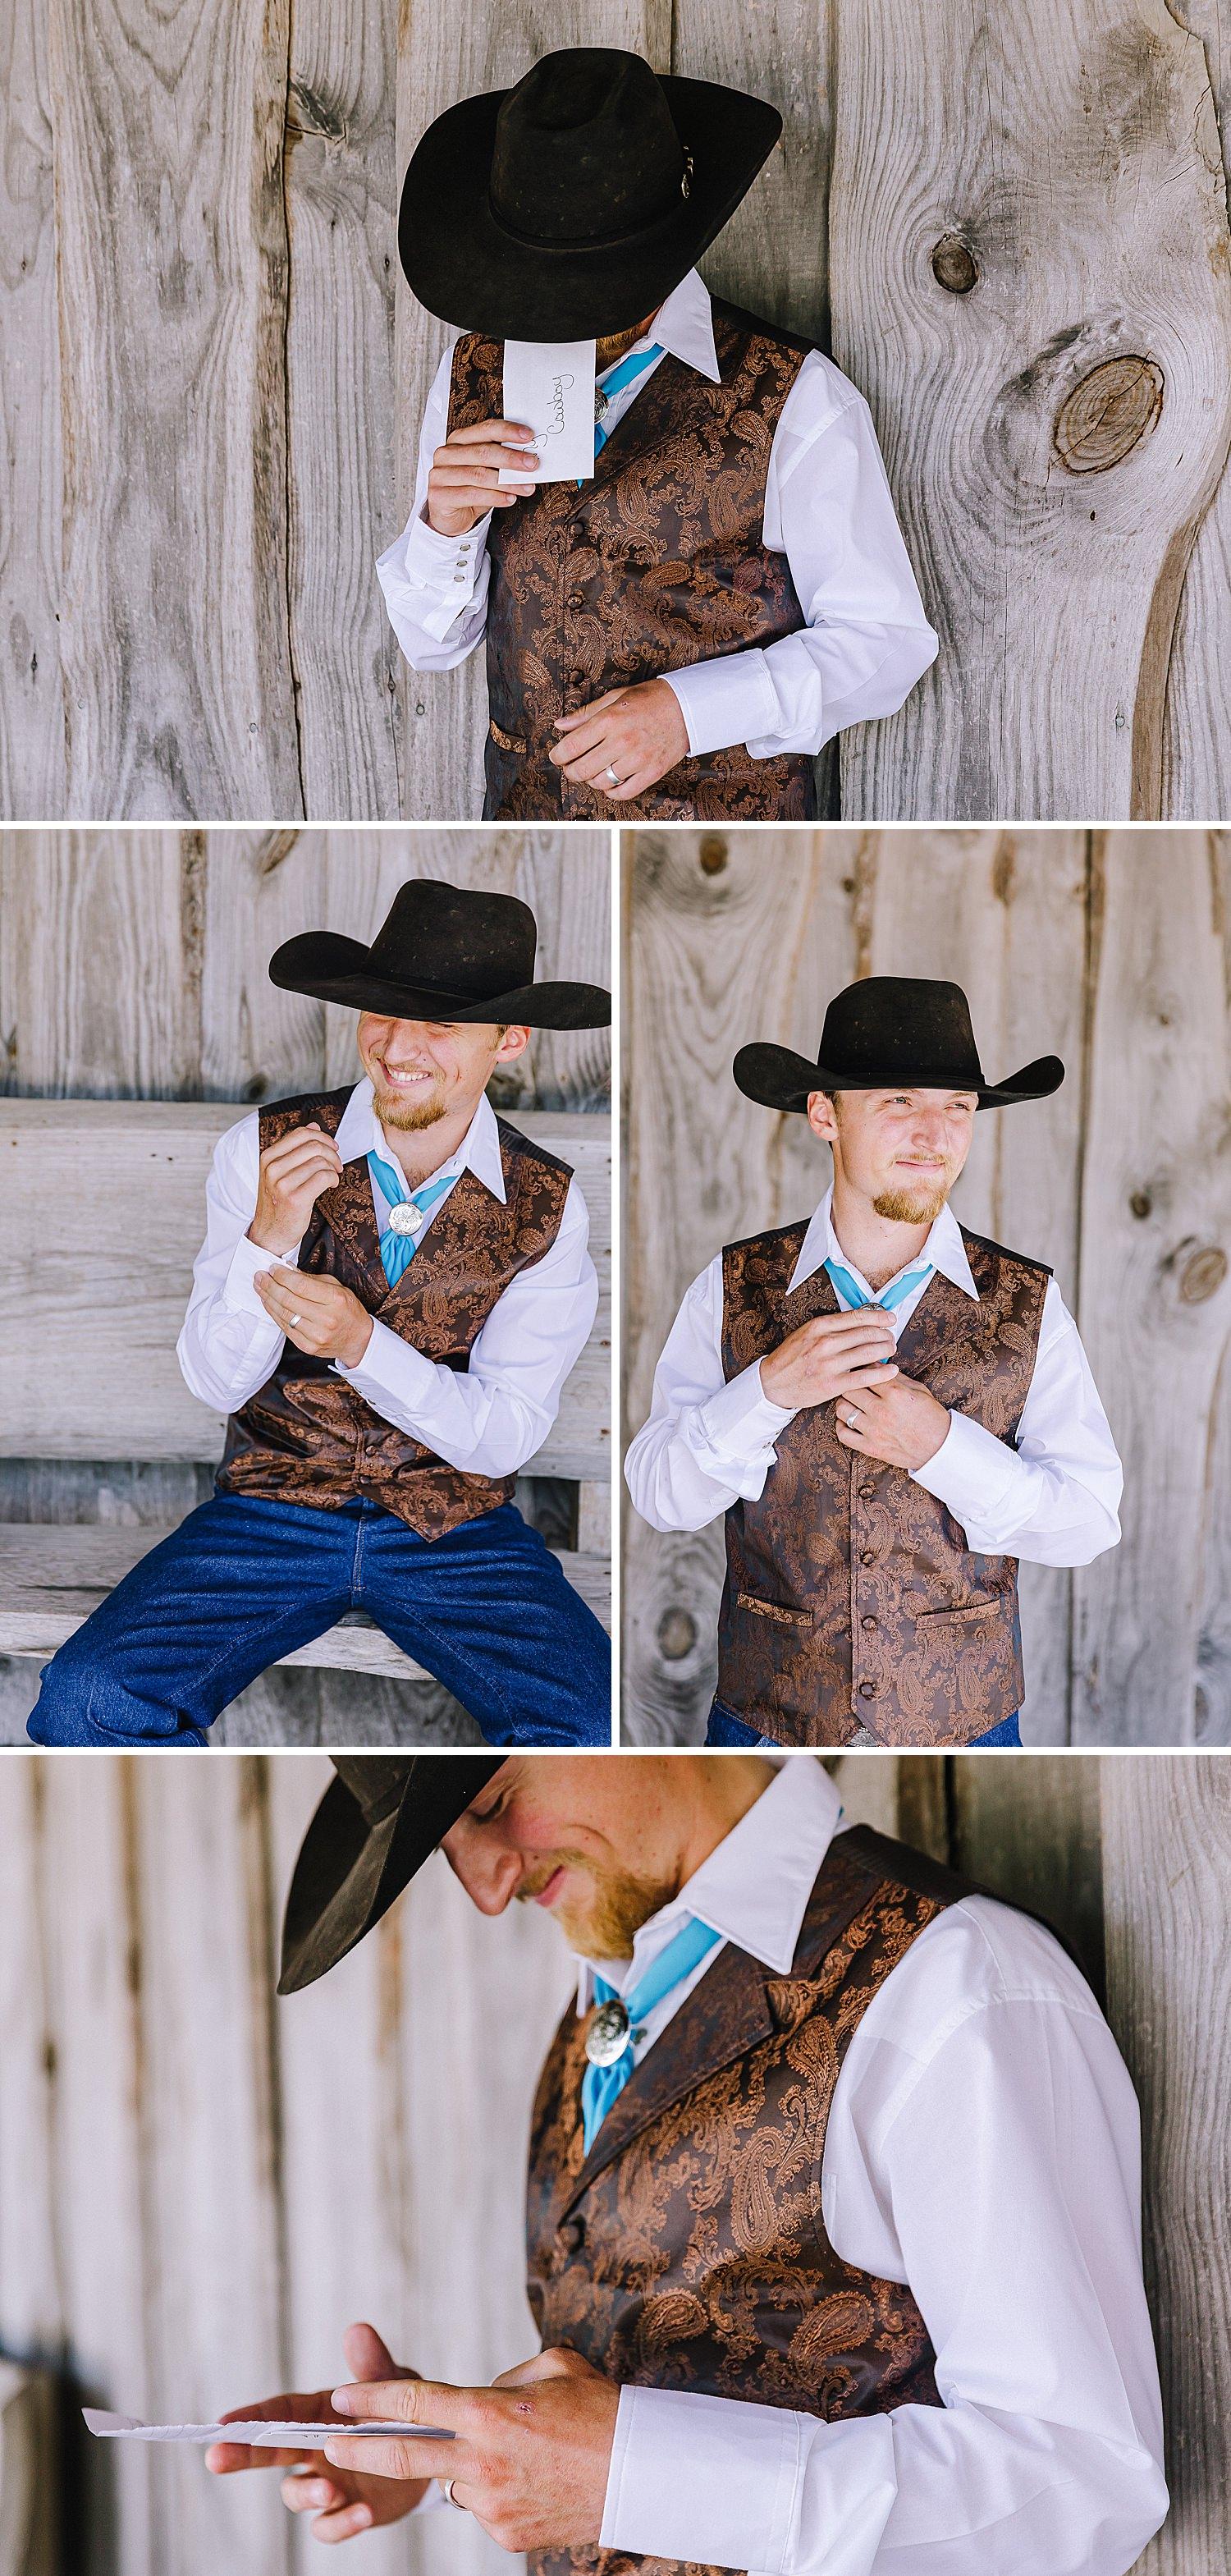 Carly-Barton-Photography-Old-Town-Texas-Rustic-Wedding-Photos-Sunflowers-Boots-Kyle-Texas_0022.jpg